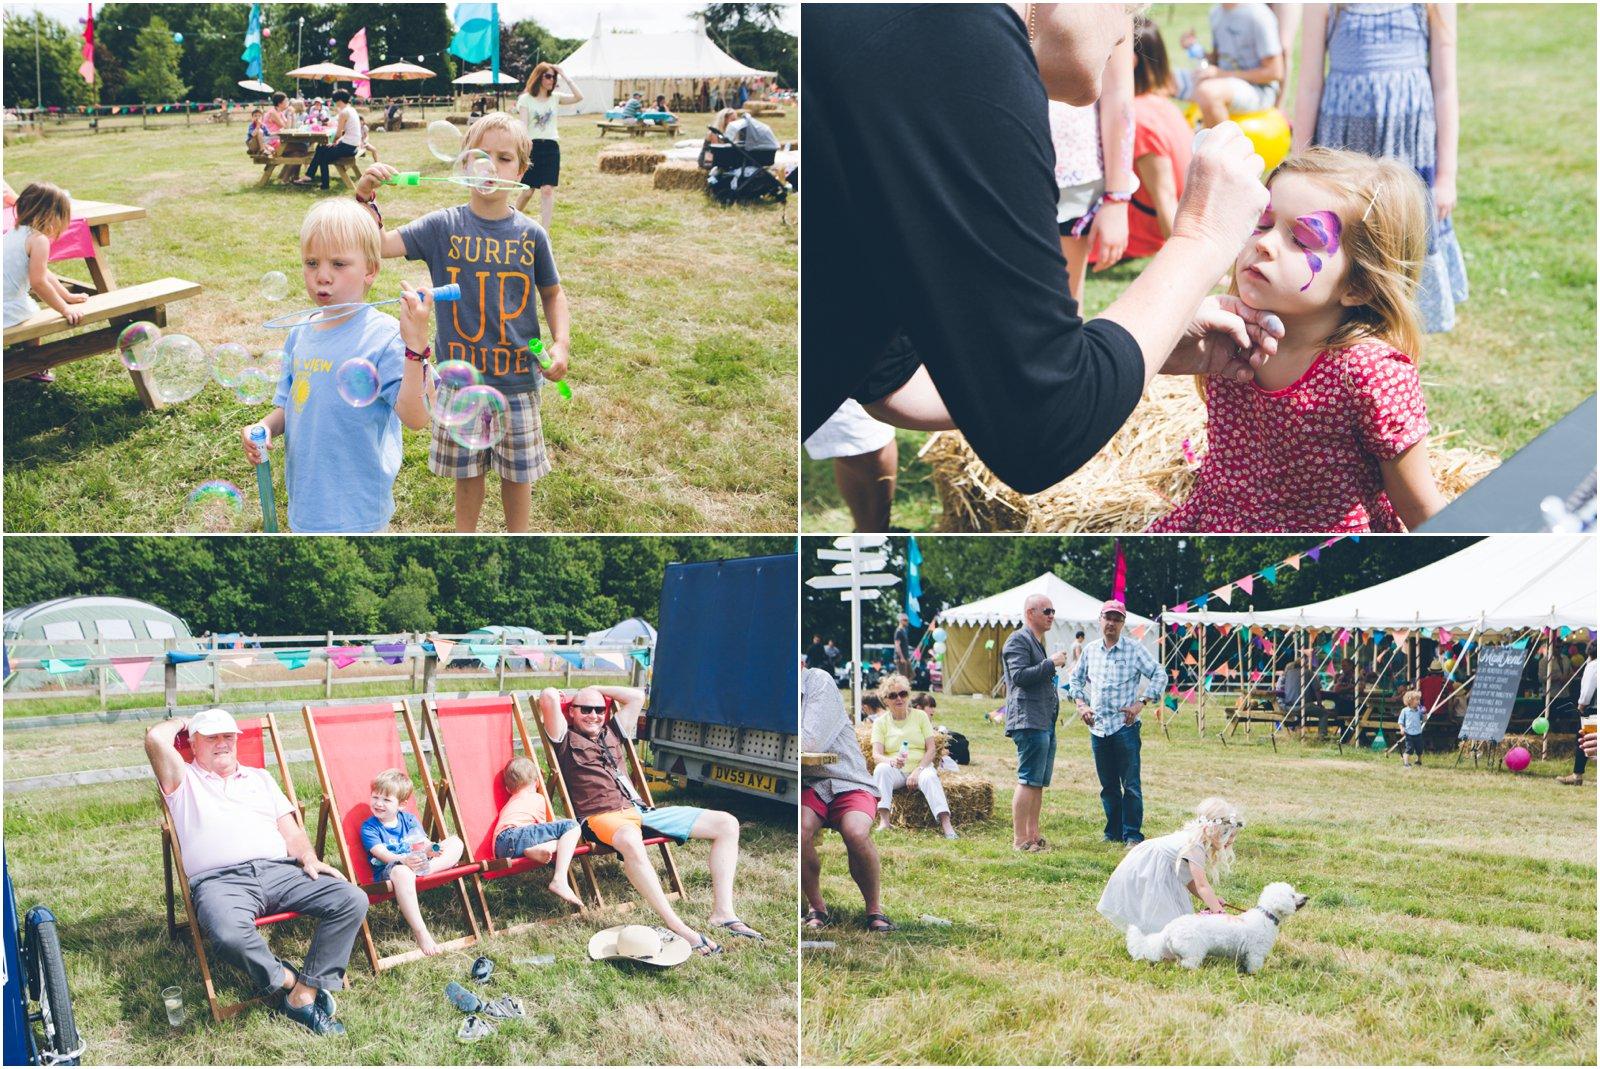 Sally and Damien's wedding festival by Summertown Pictures-49_DerrynSchmidt